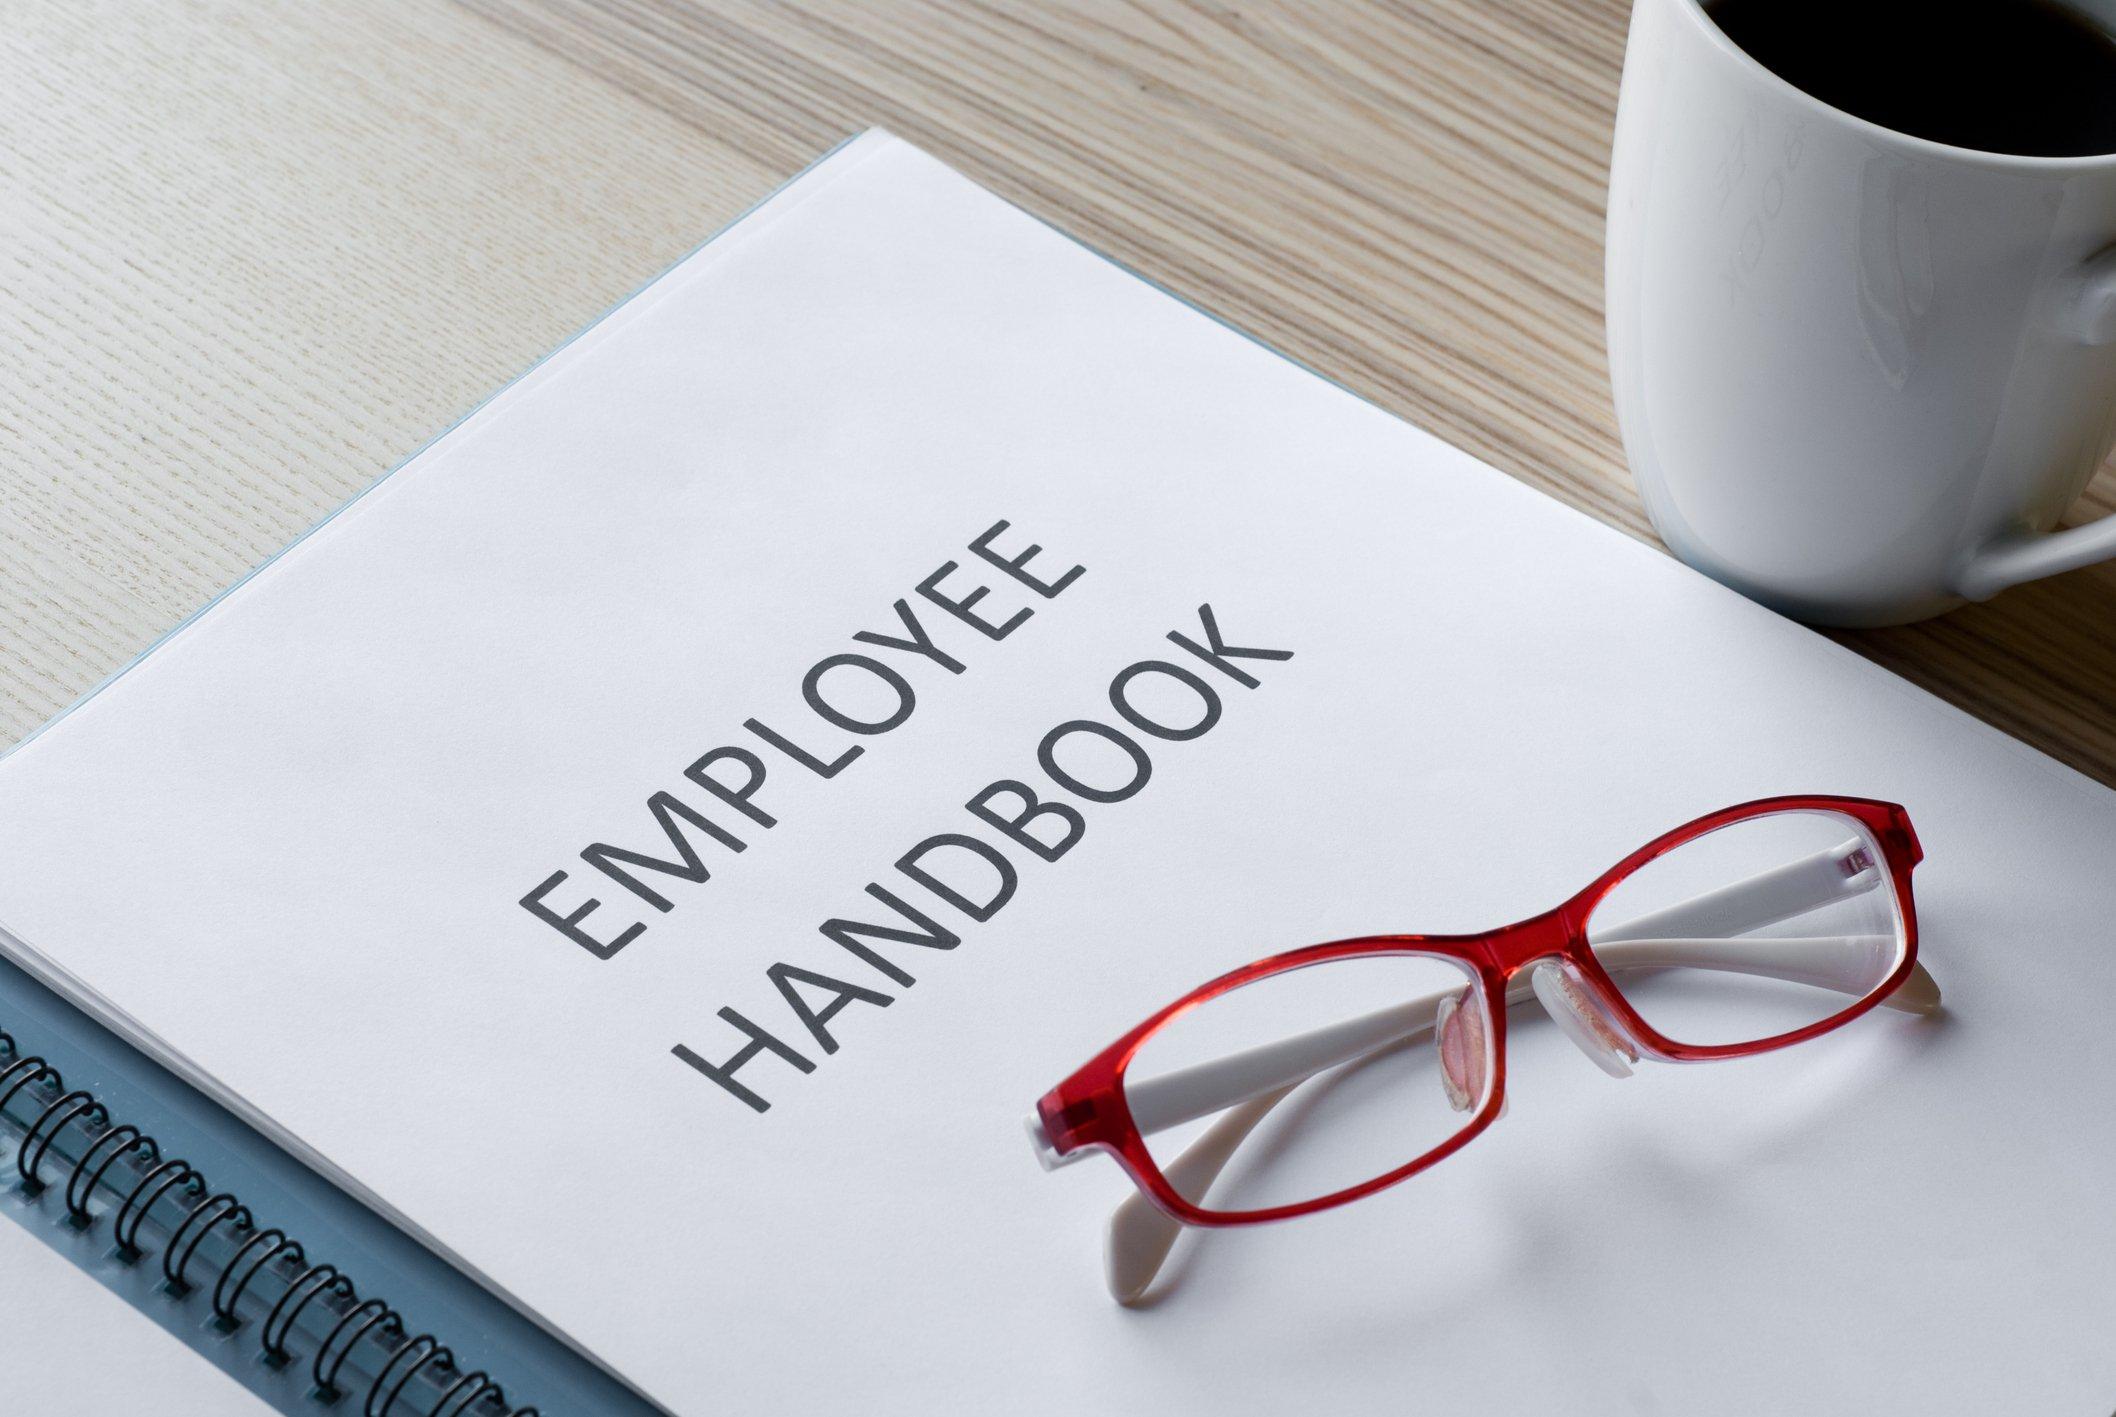 employee handbook on the table